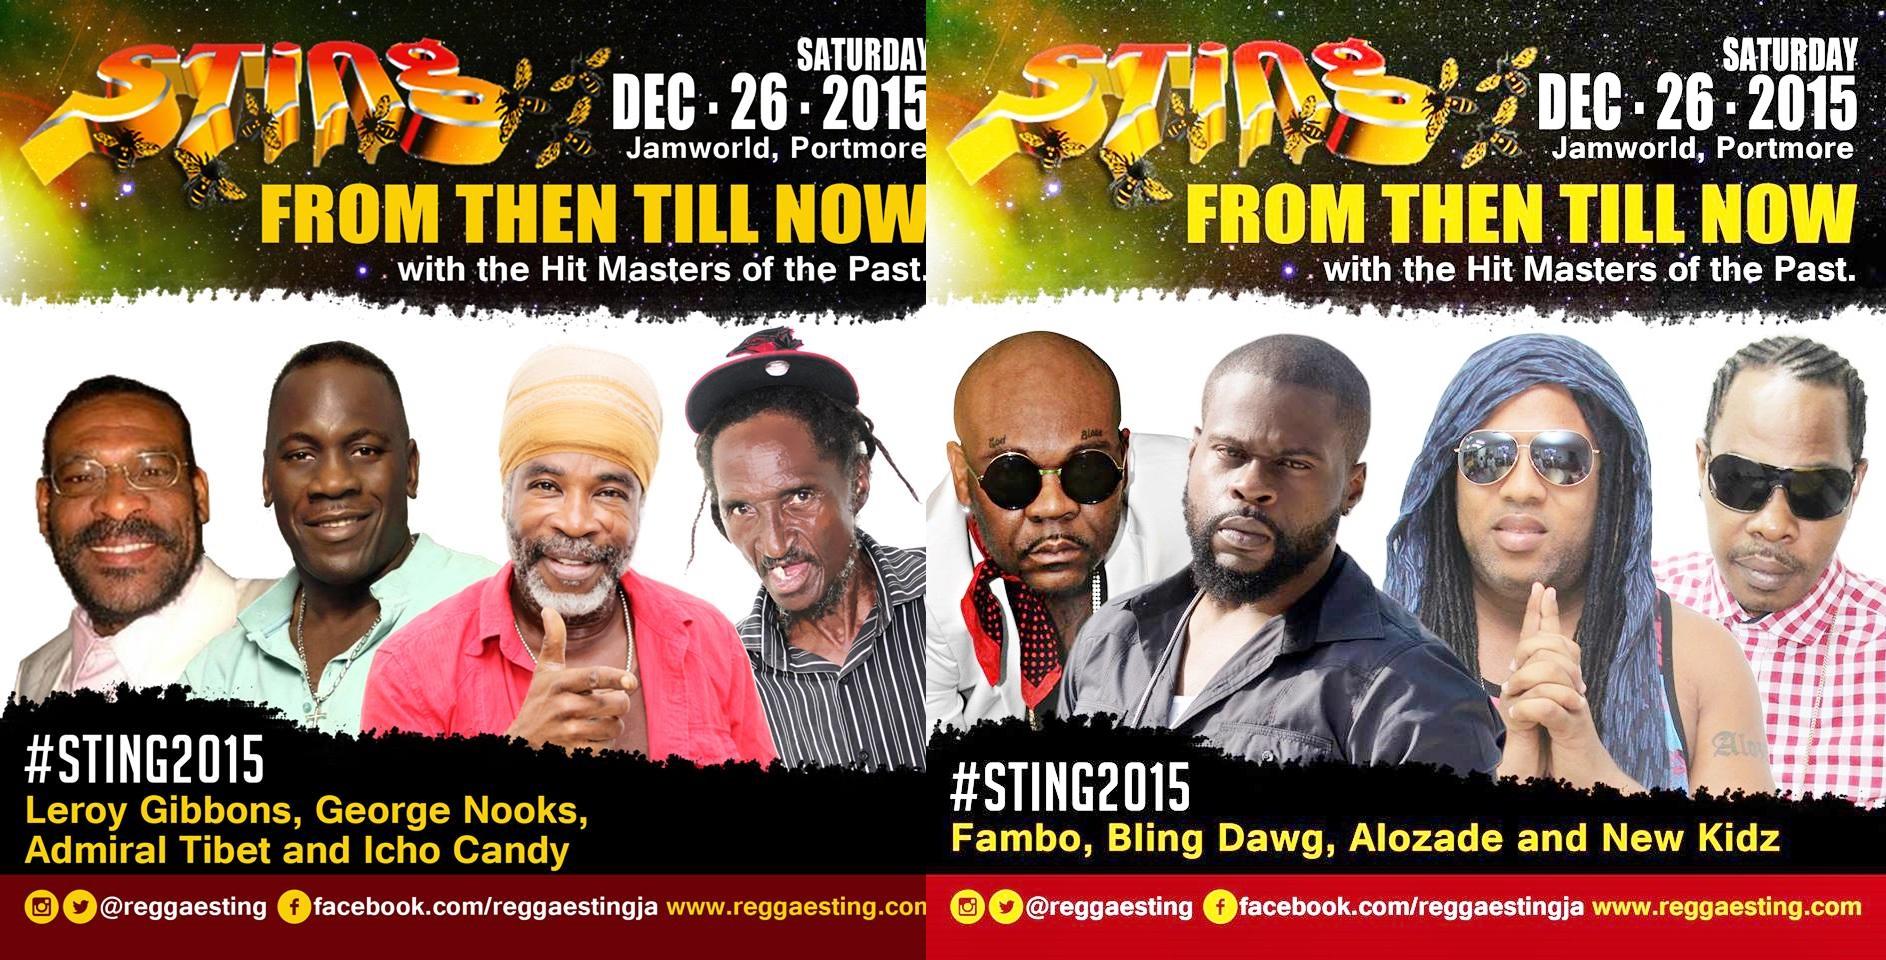 Sting jamaica 2015